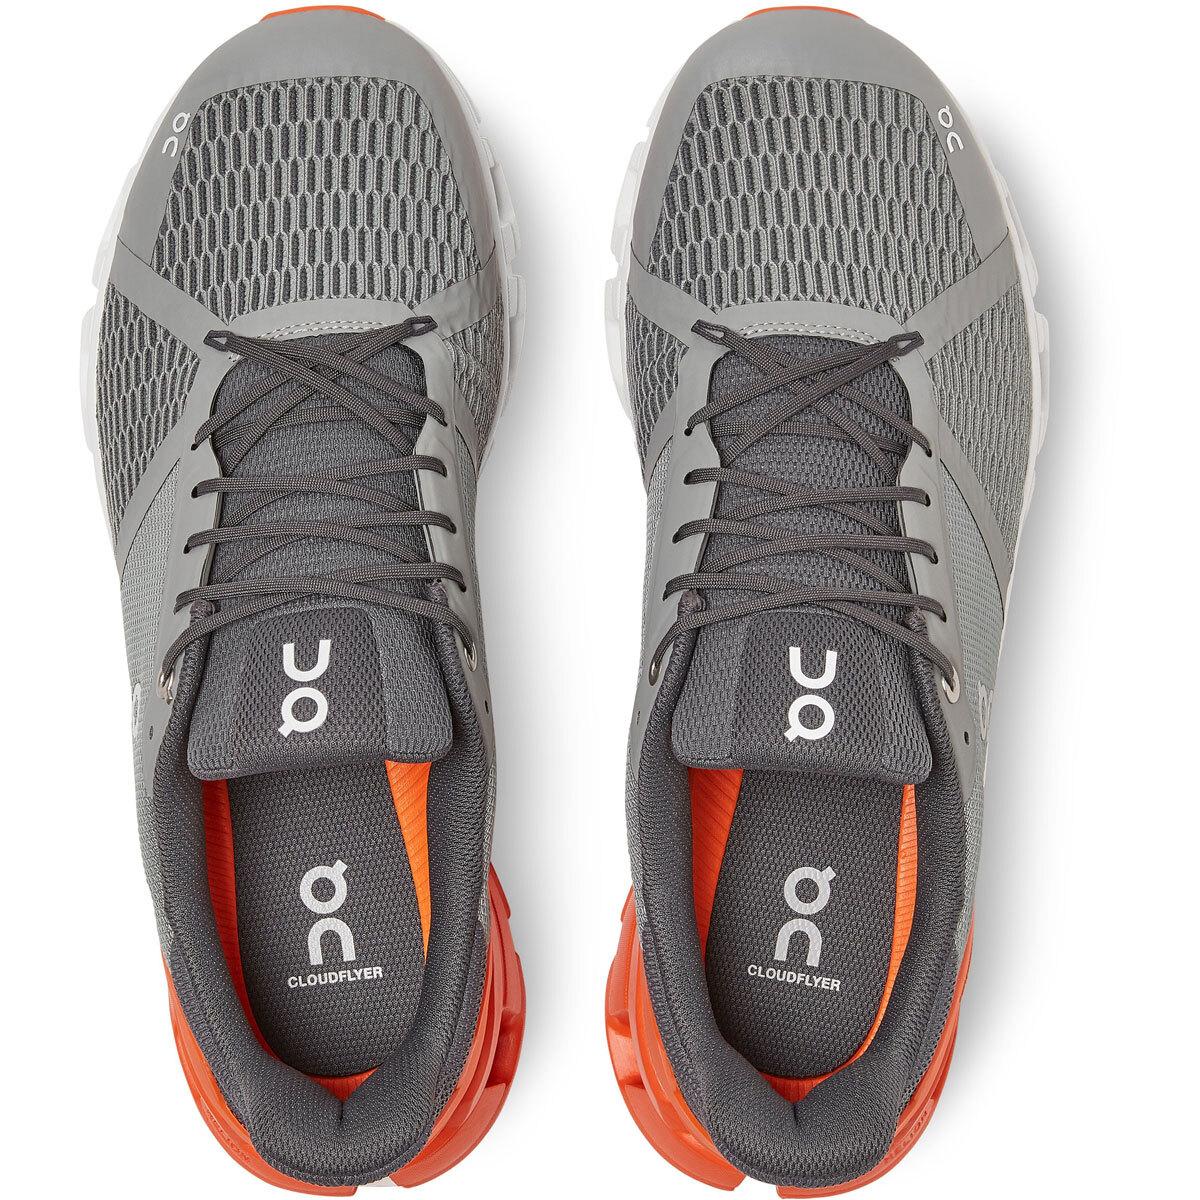 Men's On Cloudflyer 2.0 Running Shoe - Color: Grey/Orange - Size: 9 - Width: Regular, Grey/Orange, large, image 4